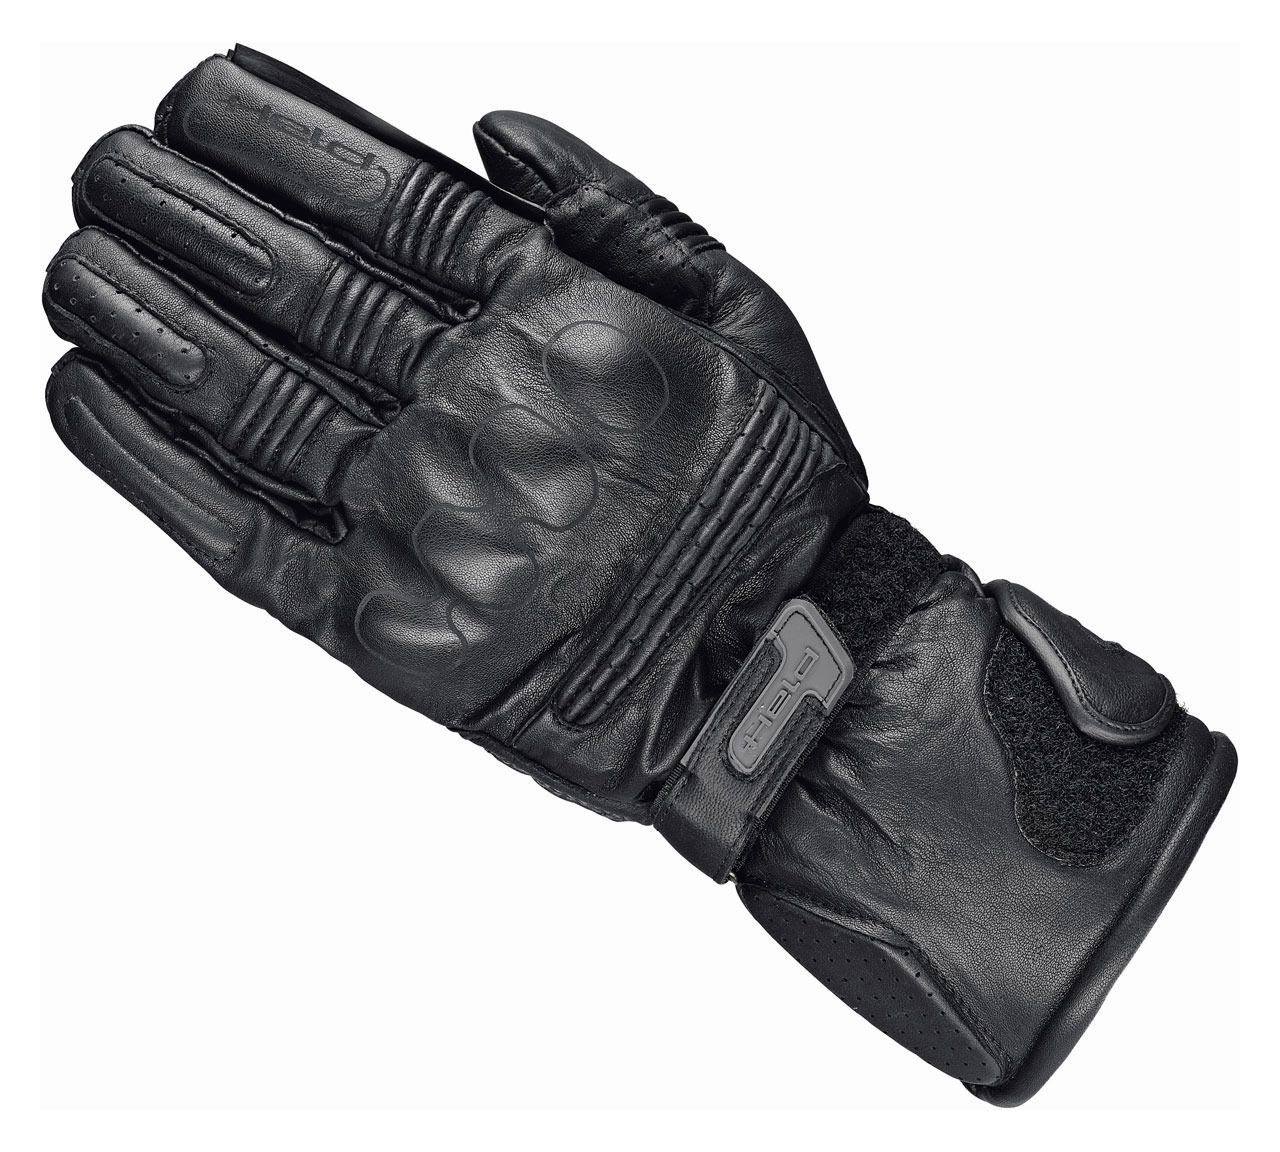 Motorcycle gloves guide - Motorcycle Gloves Guide 11